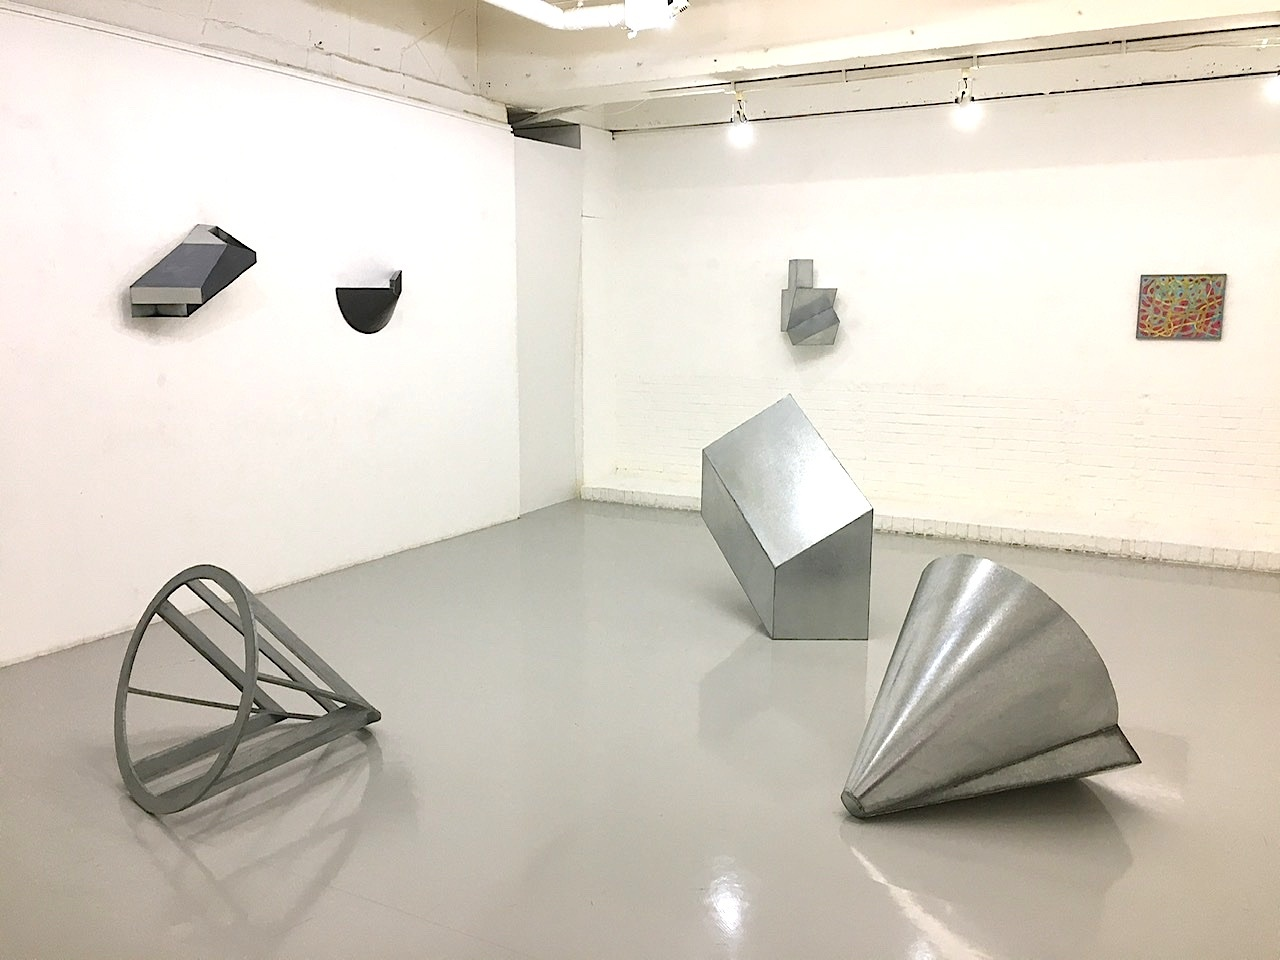 赤塚祐二&伊藤誠展/Yuji AKATSUKA & Makoto ITO exhibition_d0271004_00143990.jpeg